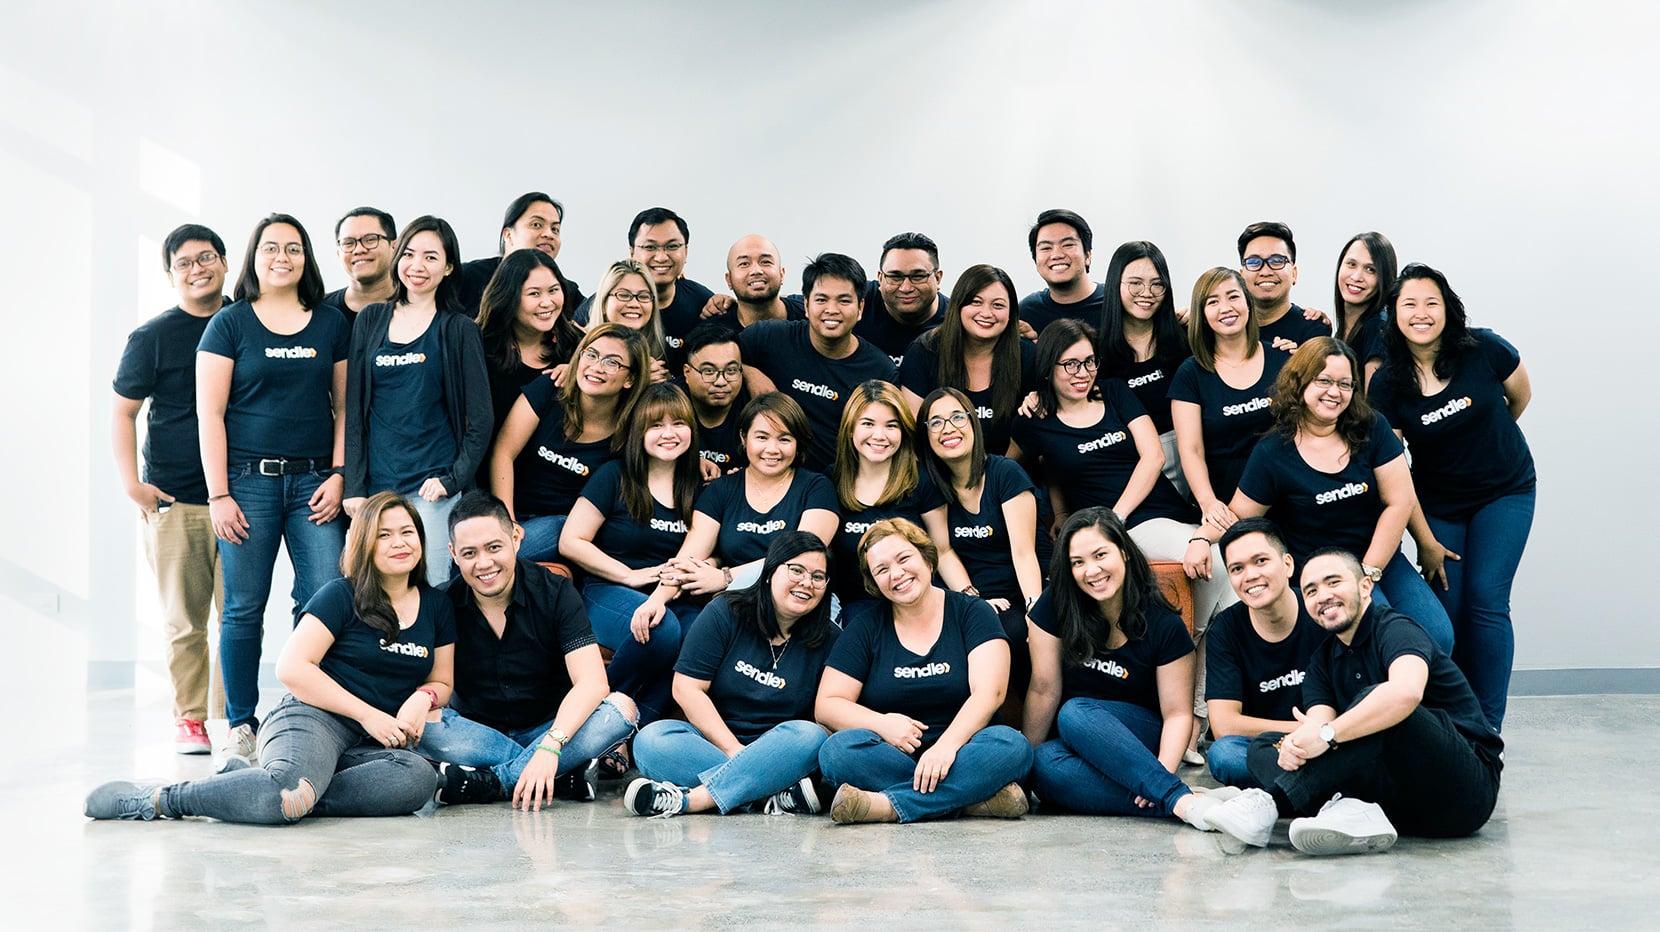 Sendle Manila team